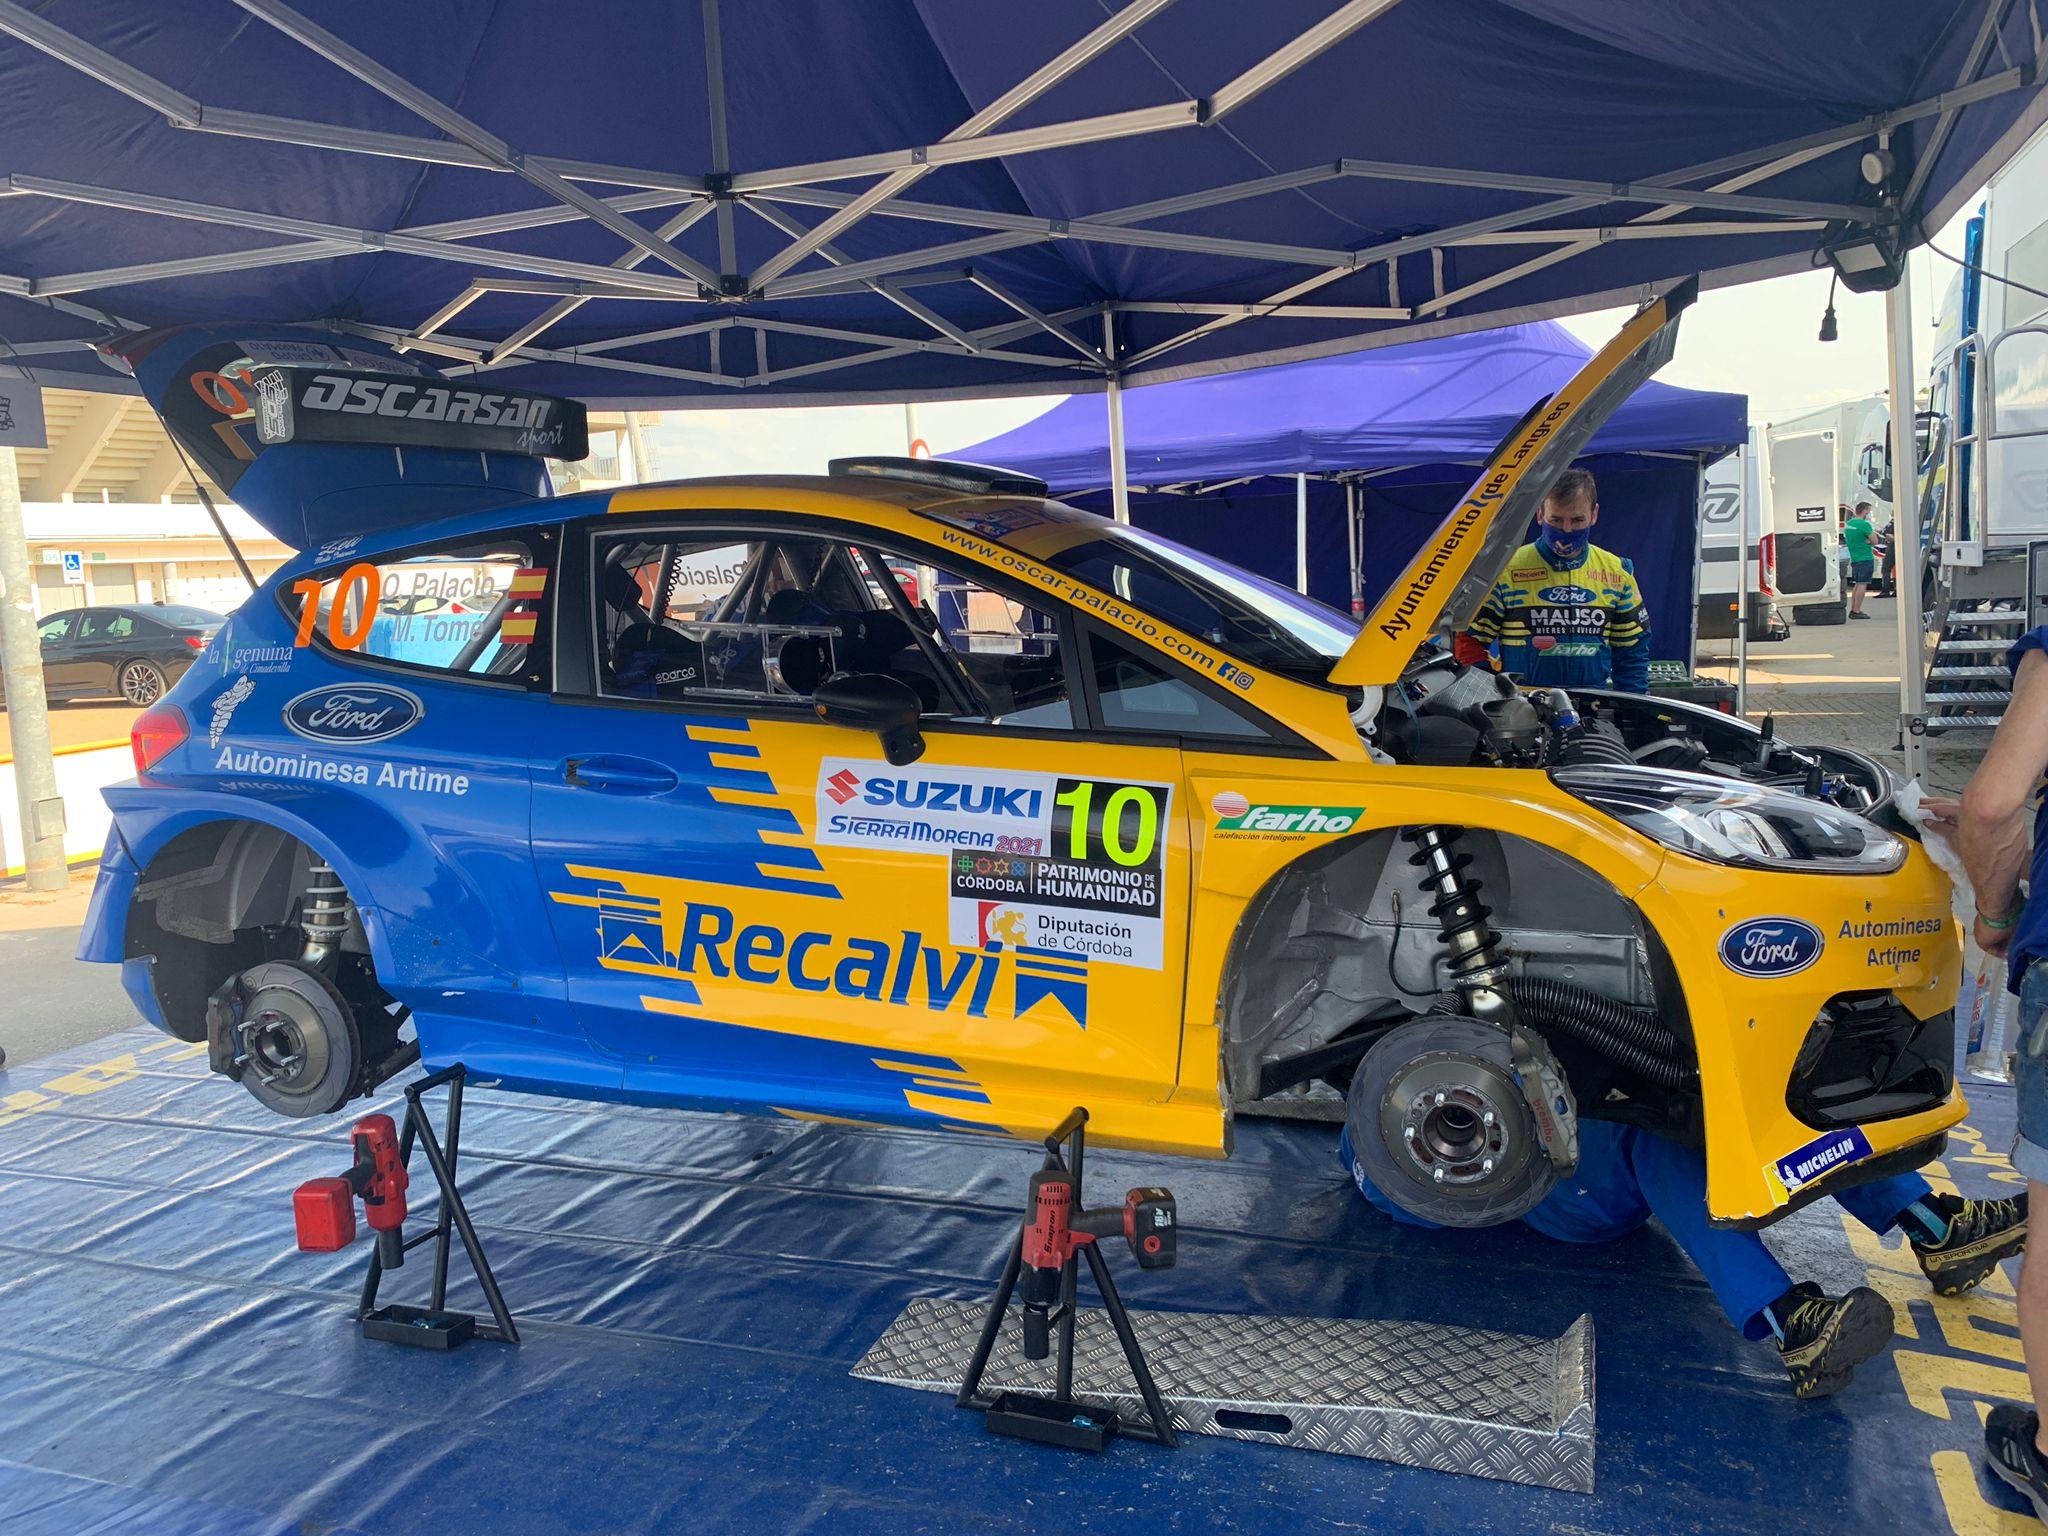 SCER + CERA + CERVH: 38º Rallye Sierra Morena - Internacional [8-10 Abril] - Página 3 Eyiz405XAAYFHqK?format=jpg&name=large